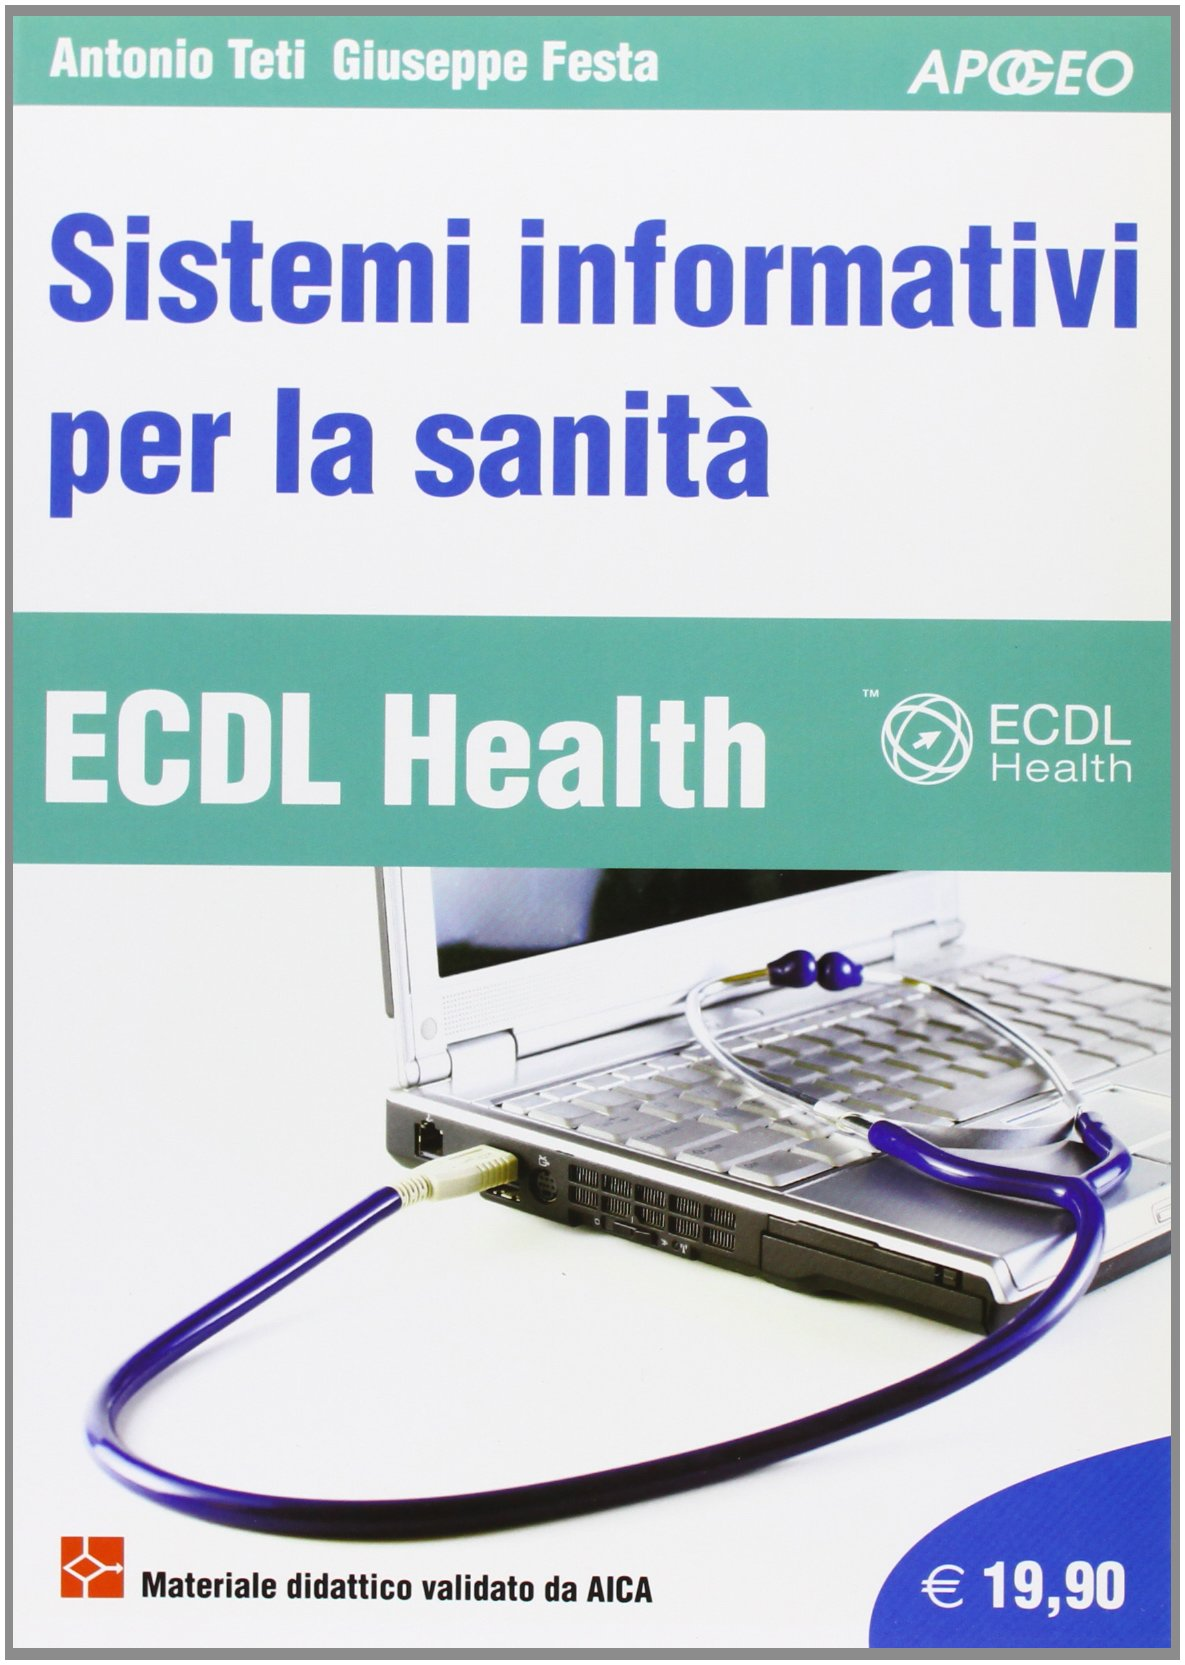 ECDL Health. Sistemi informativi per la sanità Copertina flessibile – 19 set 2013 Antonio Teti Giuseppe Festa Apogeo Education 883878728X